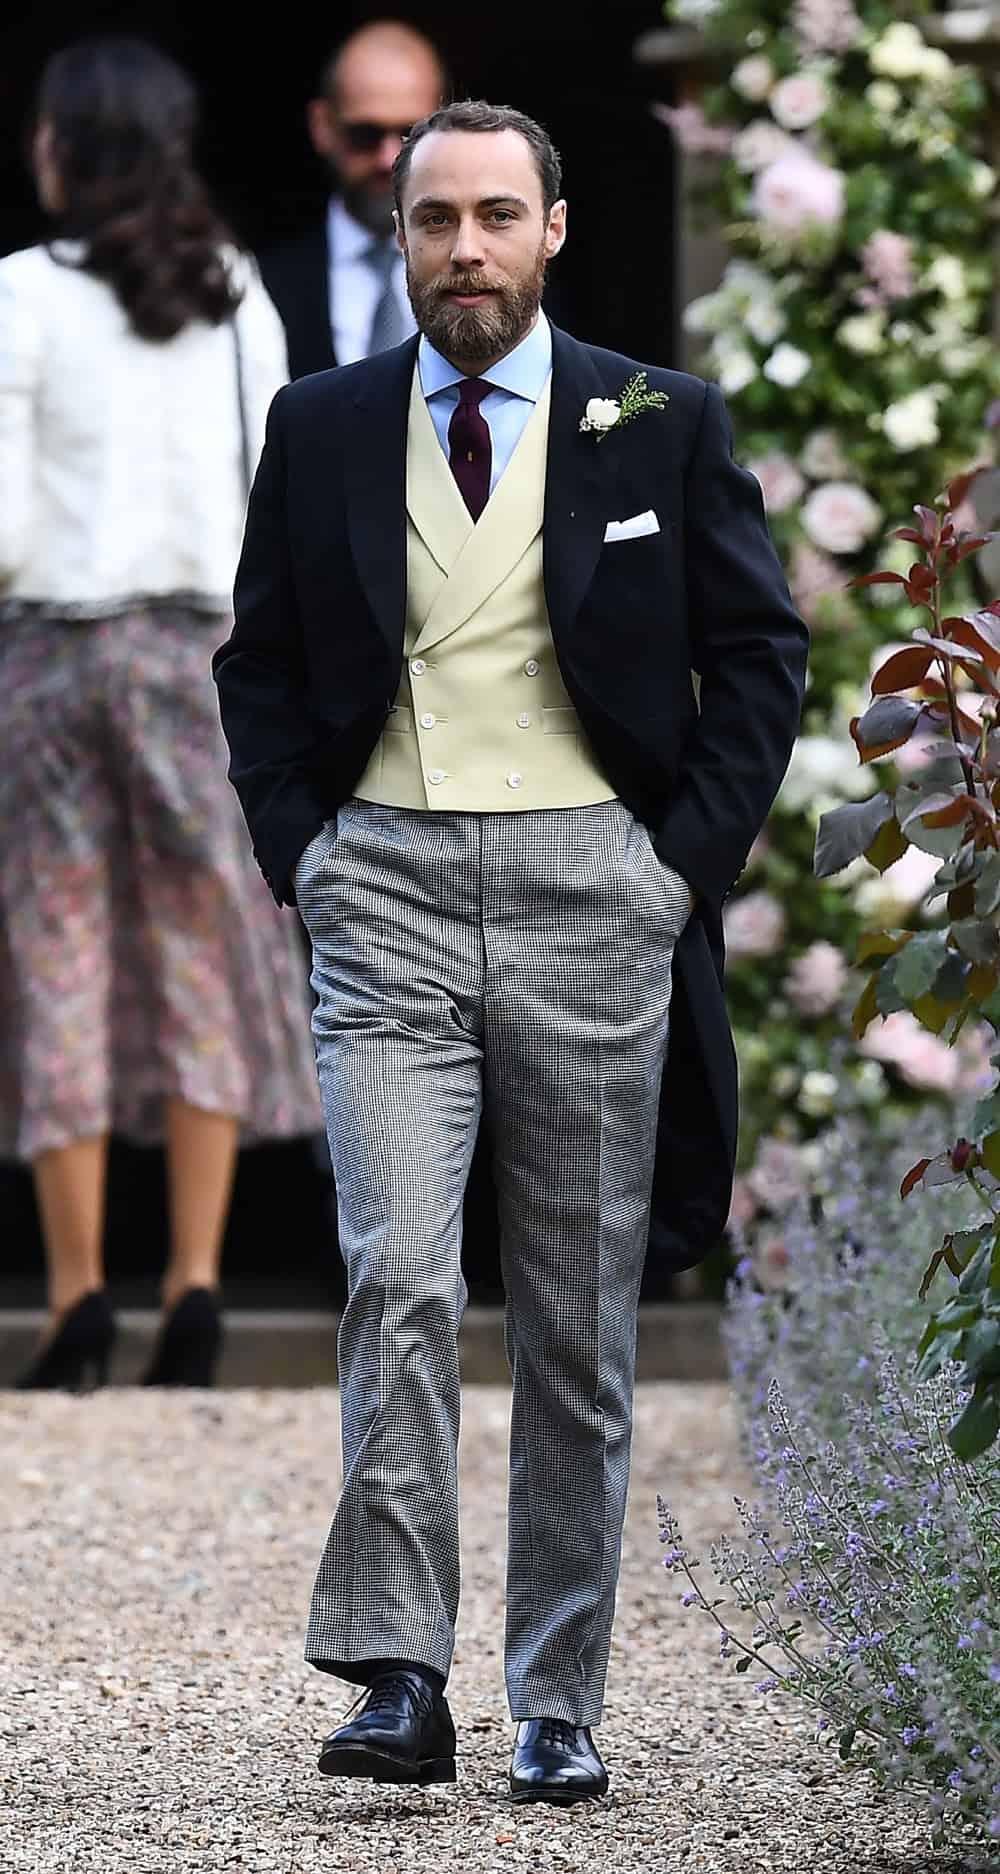 James Middleton BRITAIN-ROYALS-PEOPLE-MIDDLETON-MARRIAGE